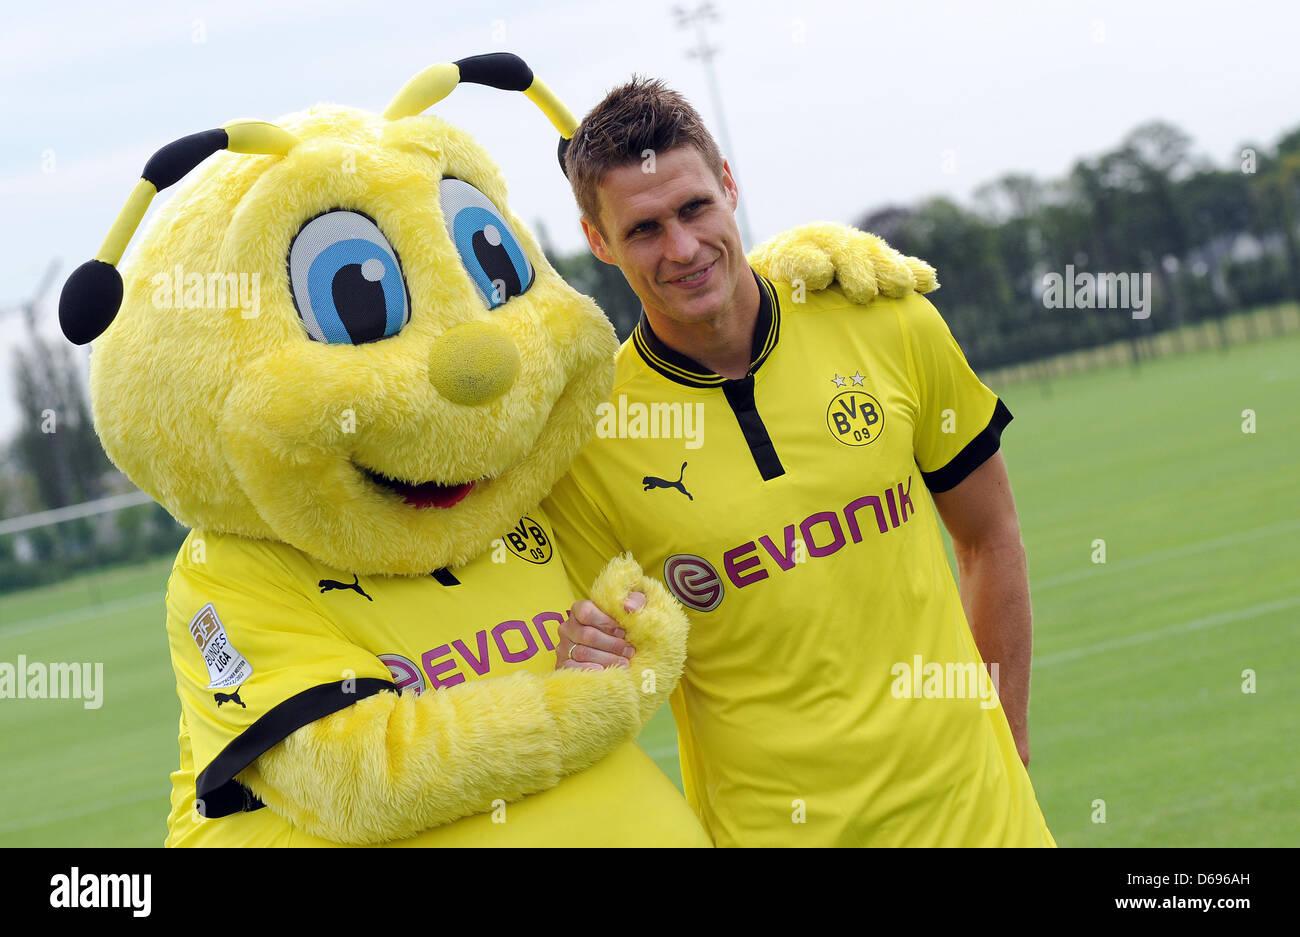 Borussia Dortmund S Sebastian Kehl And The Soccer Club S Mascot Emma Stock Photo Alamy